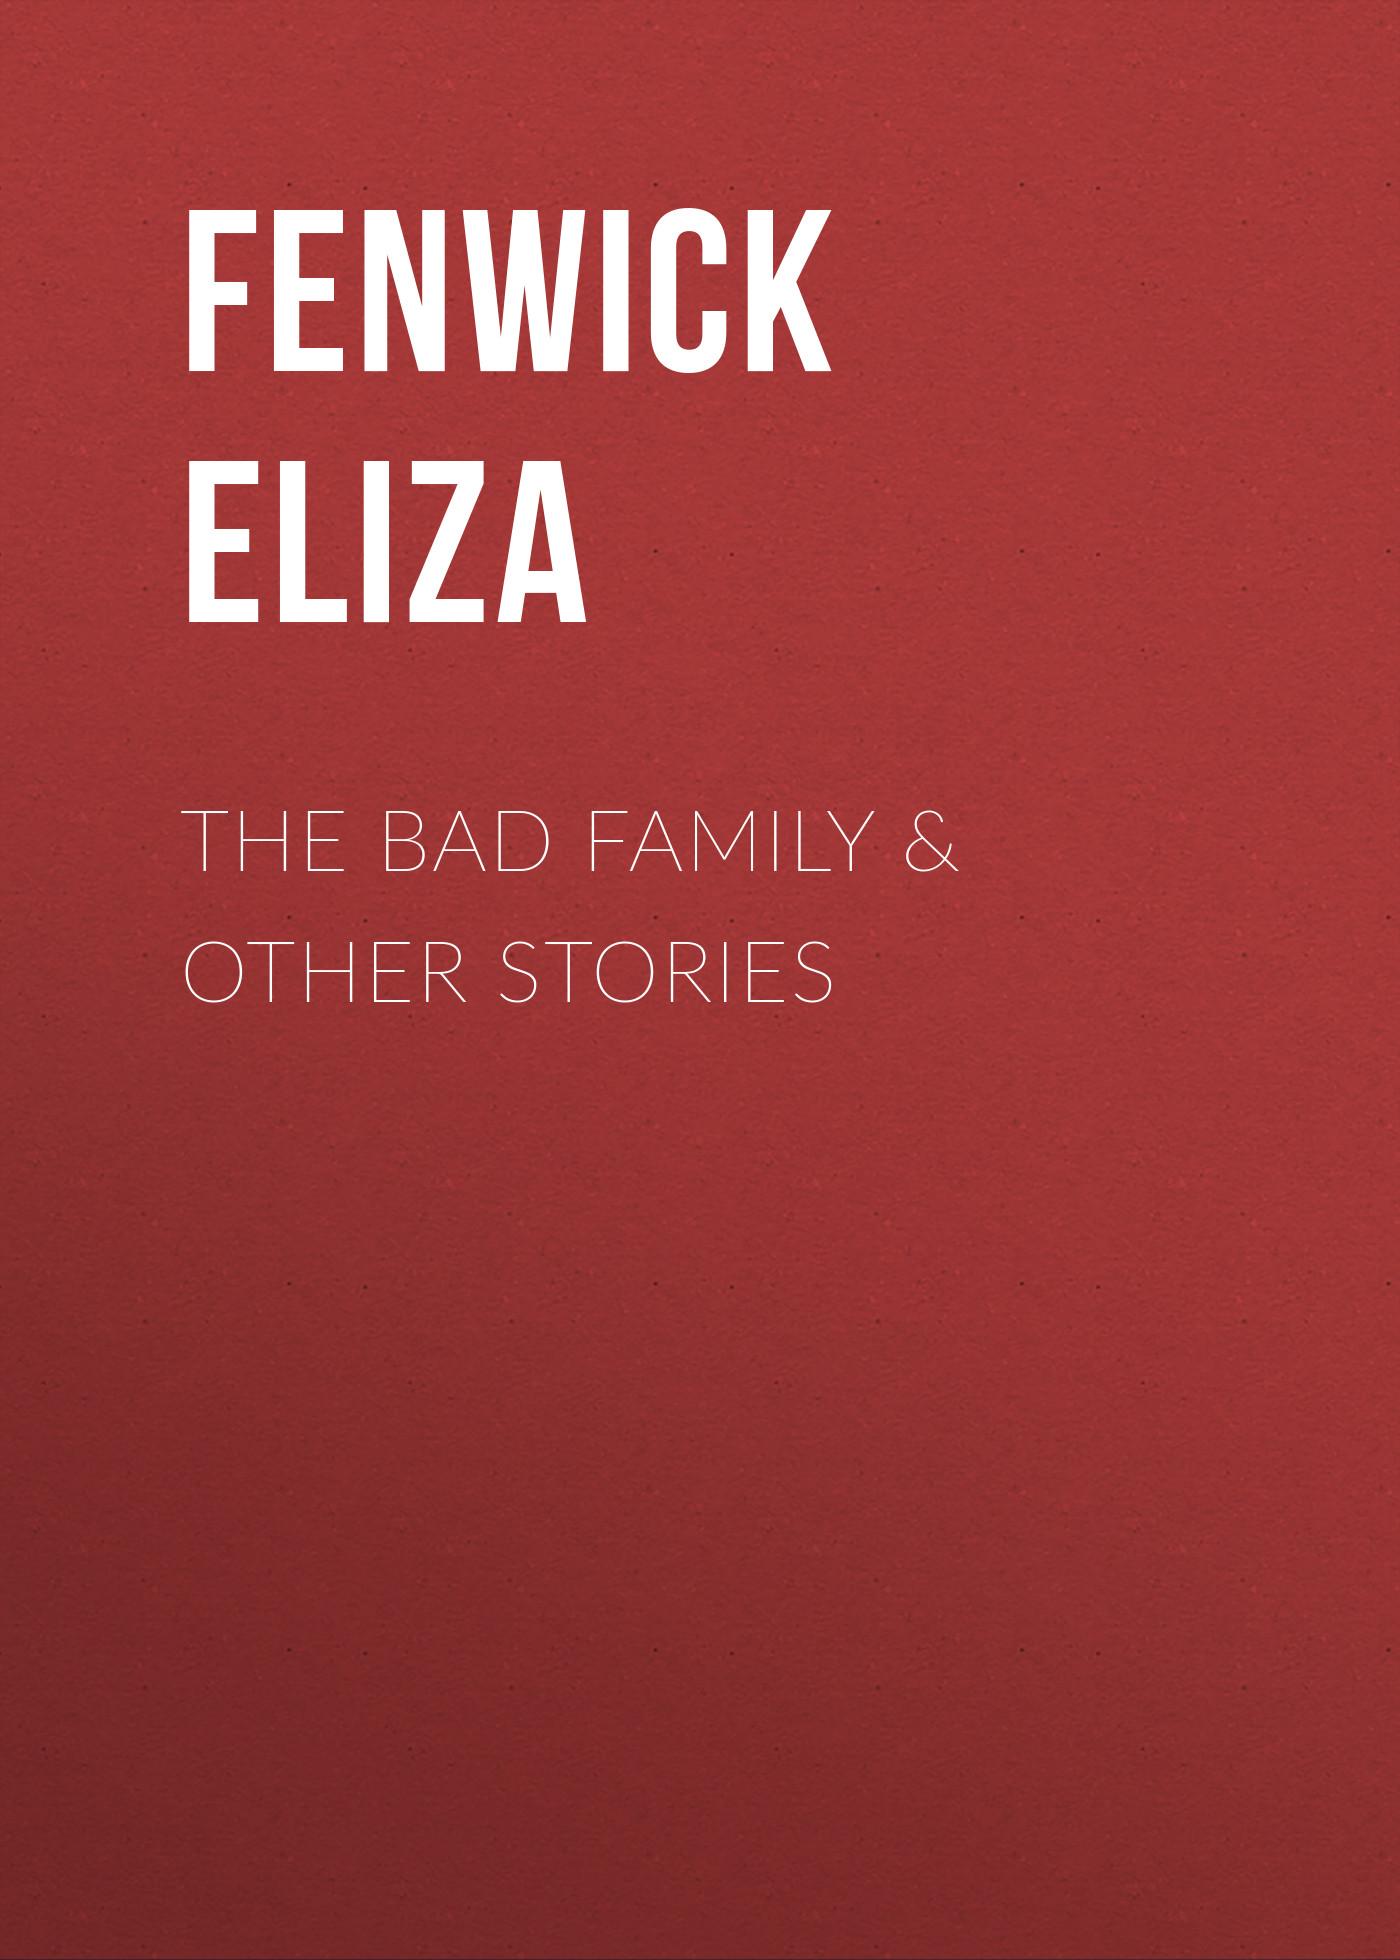 Fenwick Eliza The Bad Family & Other Stories fenwick eliza secresy or ruin on the rock